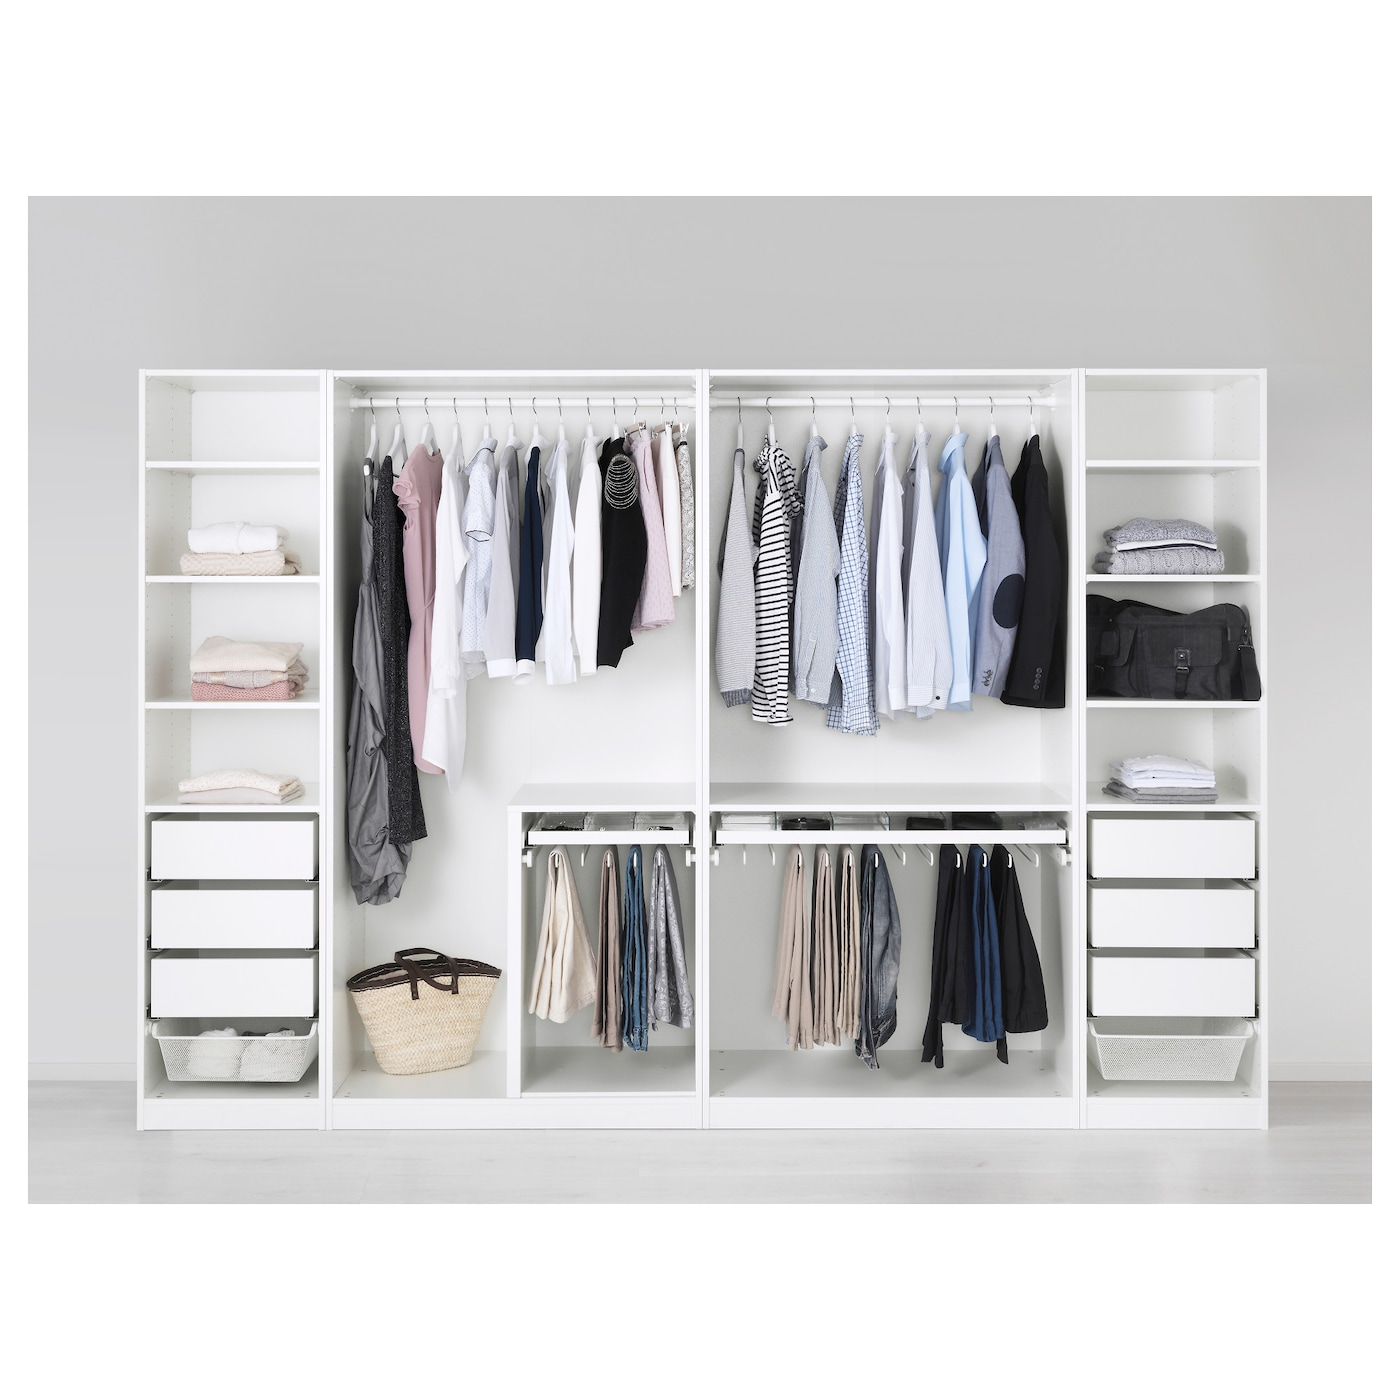 Pax Wardrobe White Tyssedal Tyssedal Glass 118 1 8x23 5 8x79 1